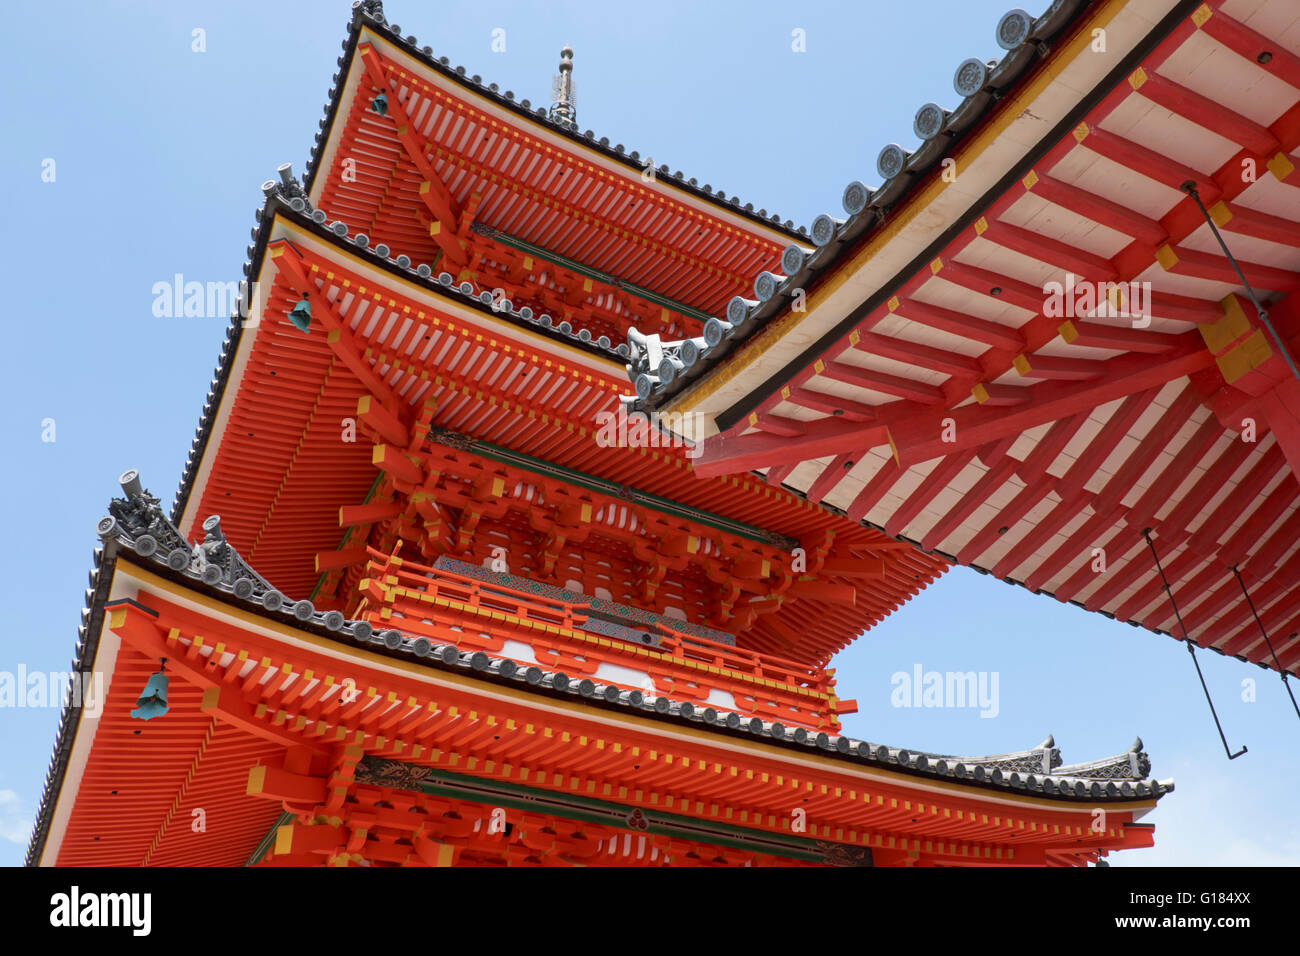 KIYOMIZU DERA, TEMPLE, PAGODA, SANJU-NO-TO, KYOTO, JAPAN, THREE STORY PAGODA - Stock Image